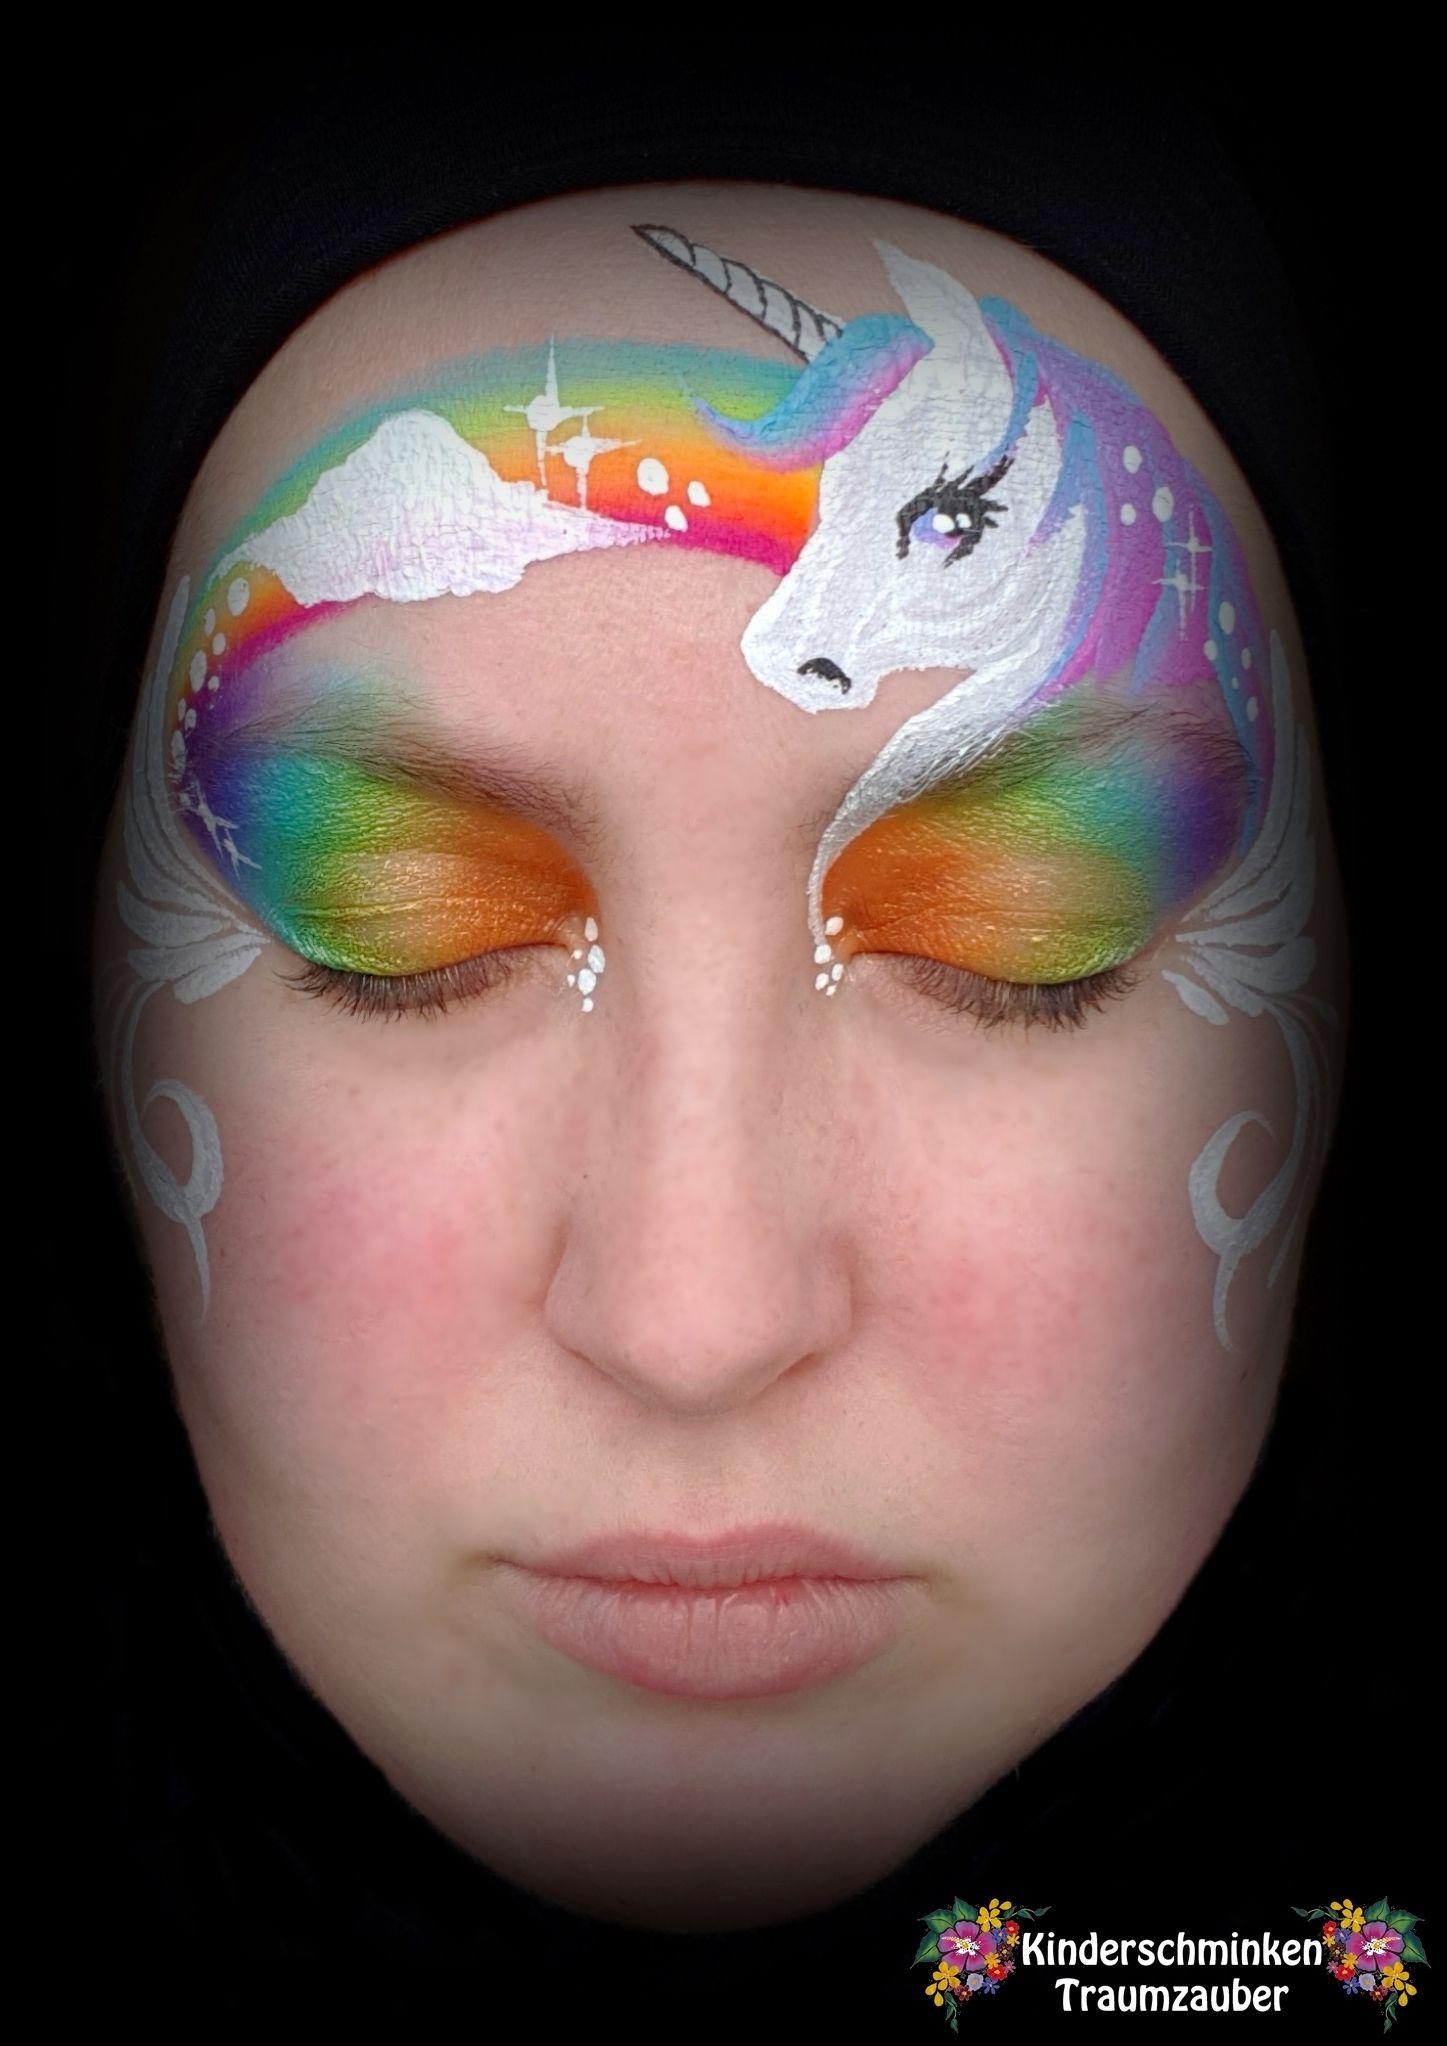 Galerie Fasching Pinterest Kinder Schminken Gesicht Schminken